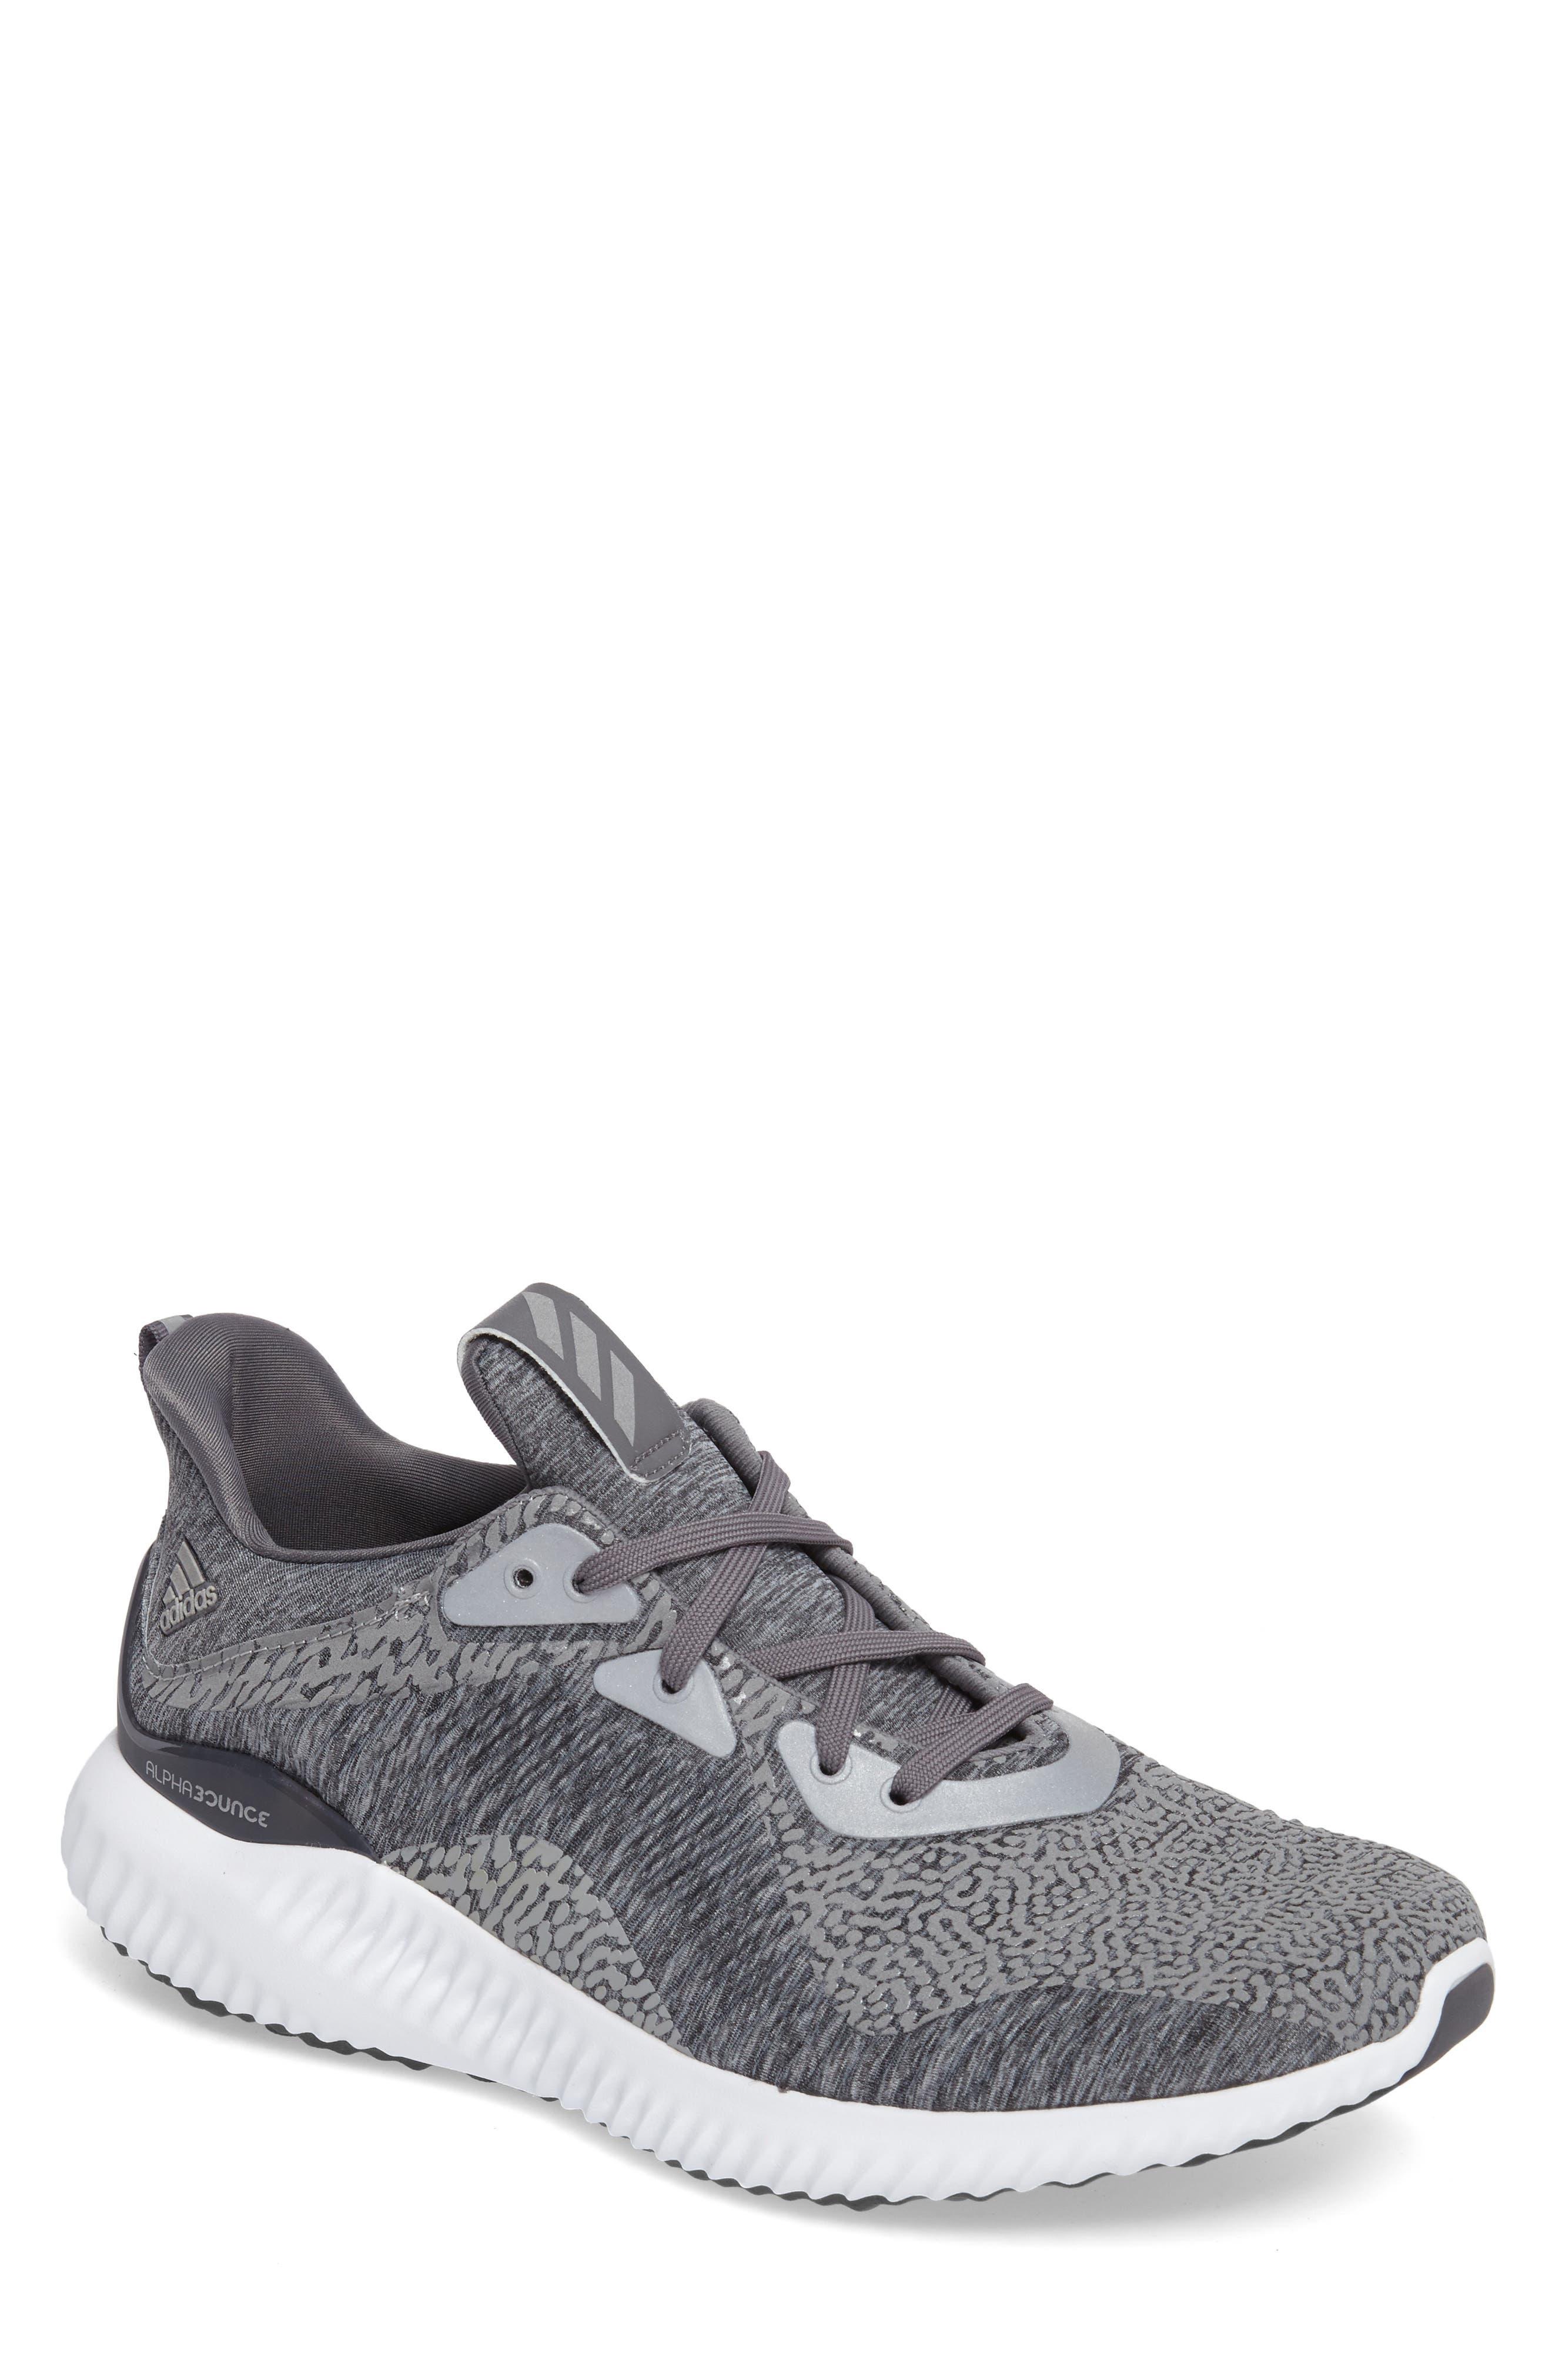 adidas Alphabounce Aramis Sneaker (Men)